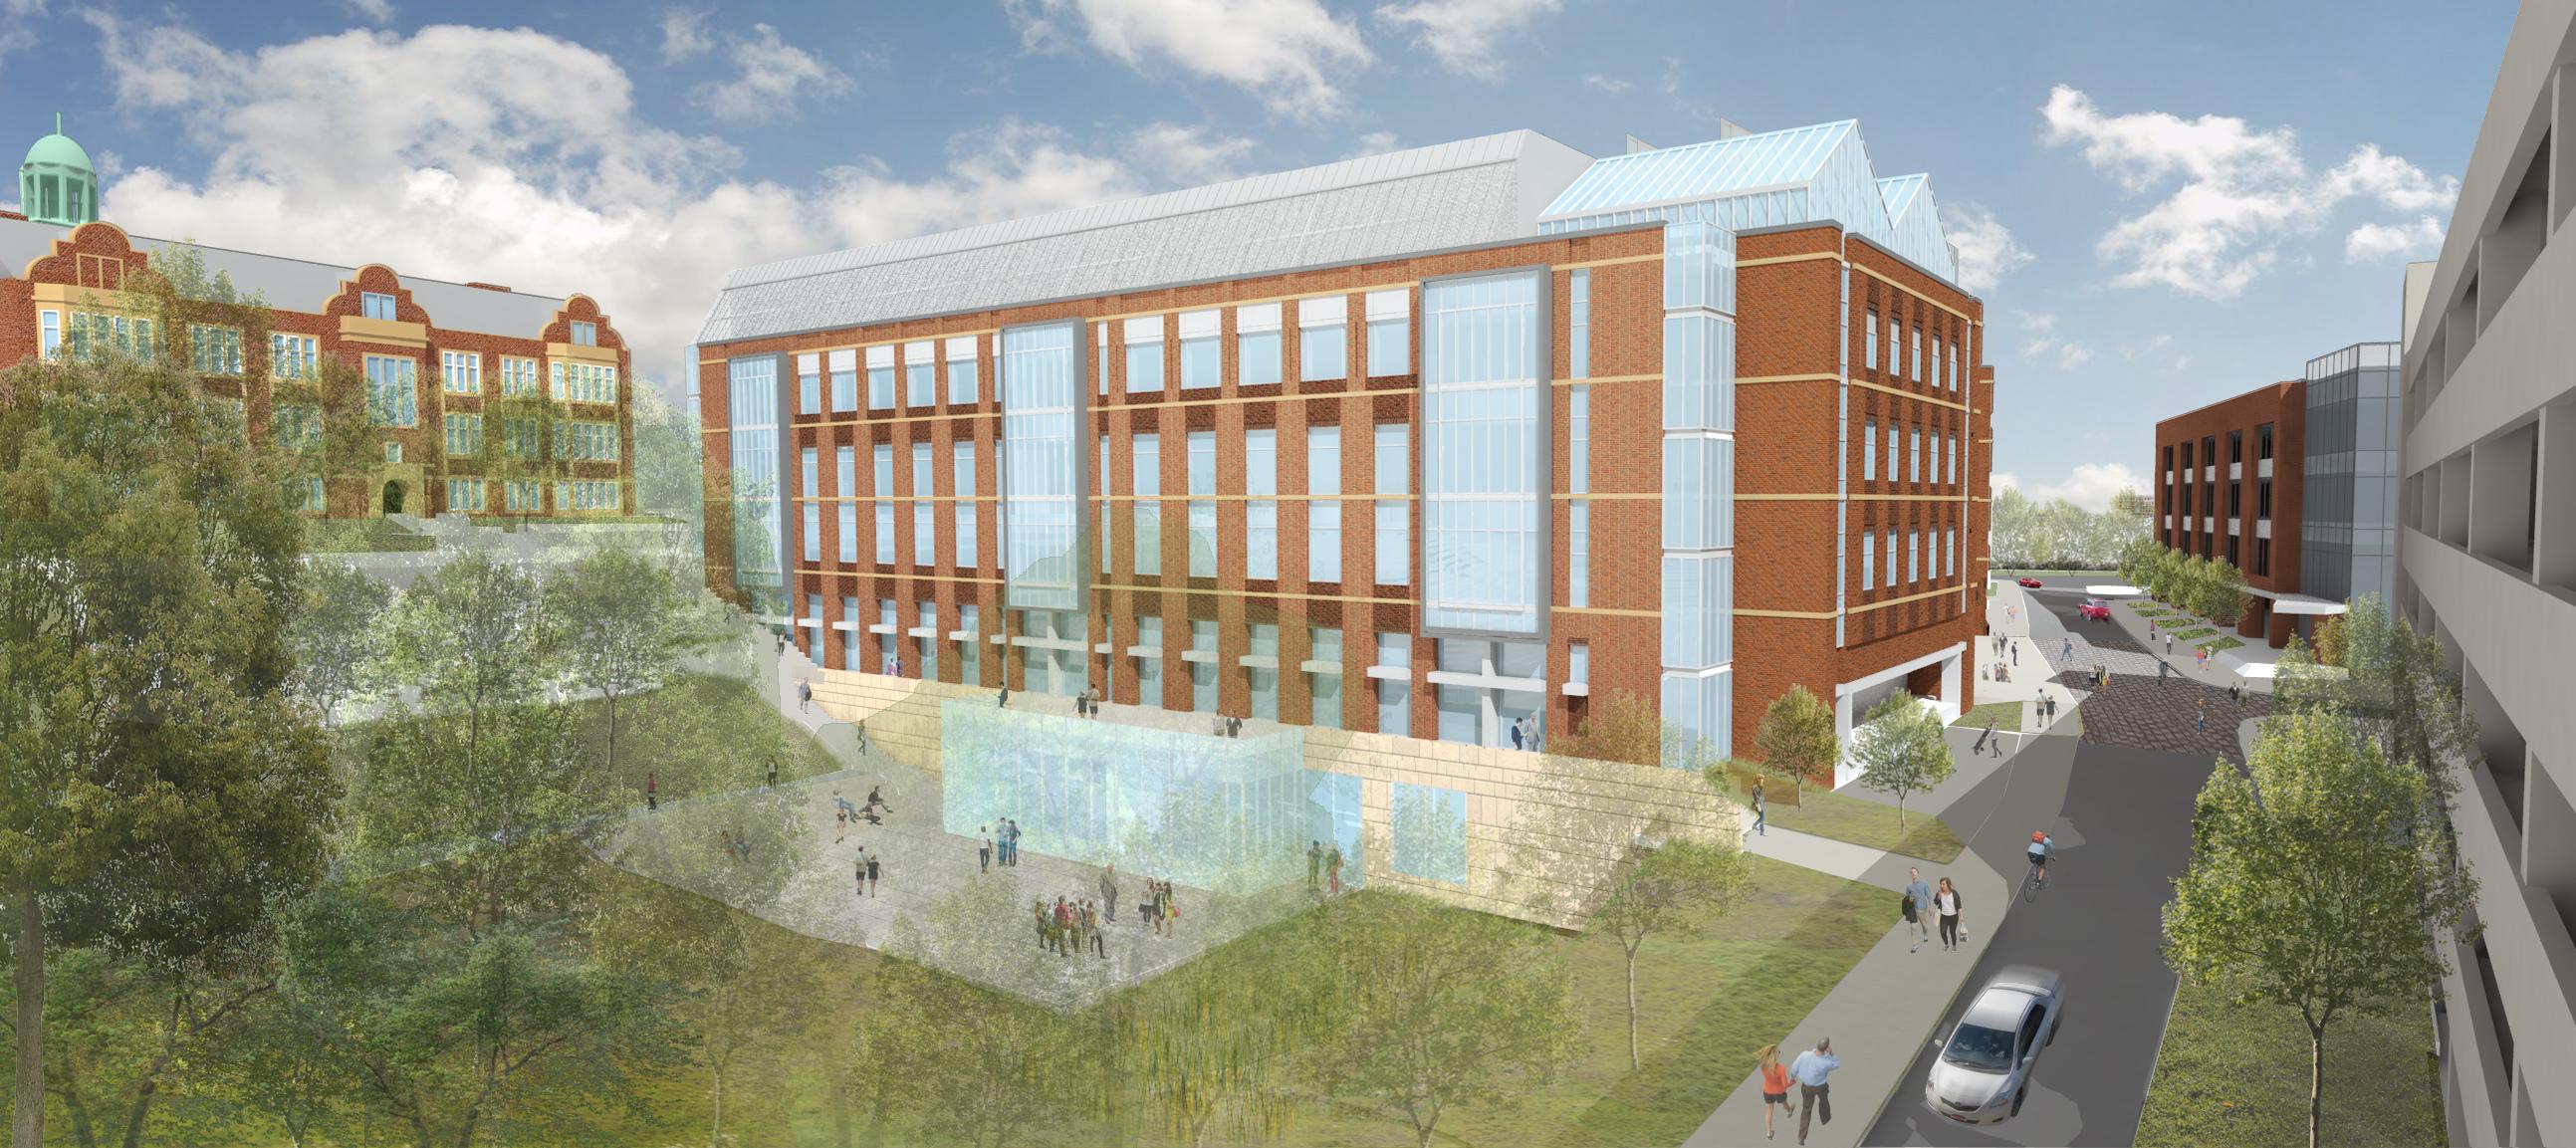 Towson University fcsm-building rendering 1